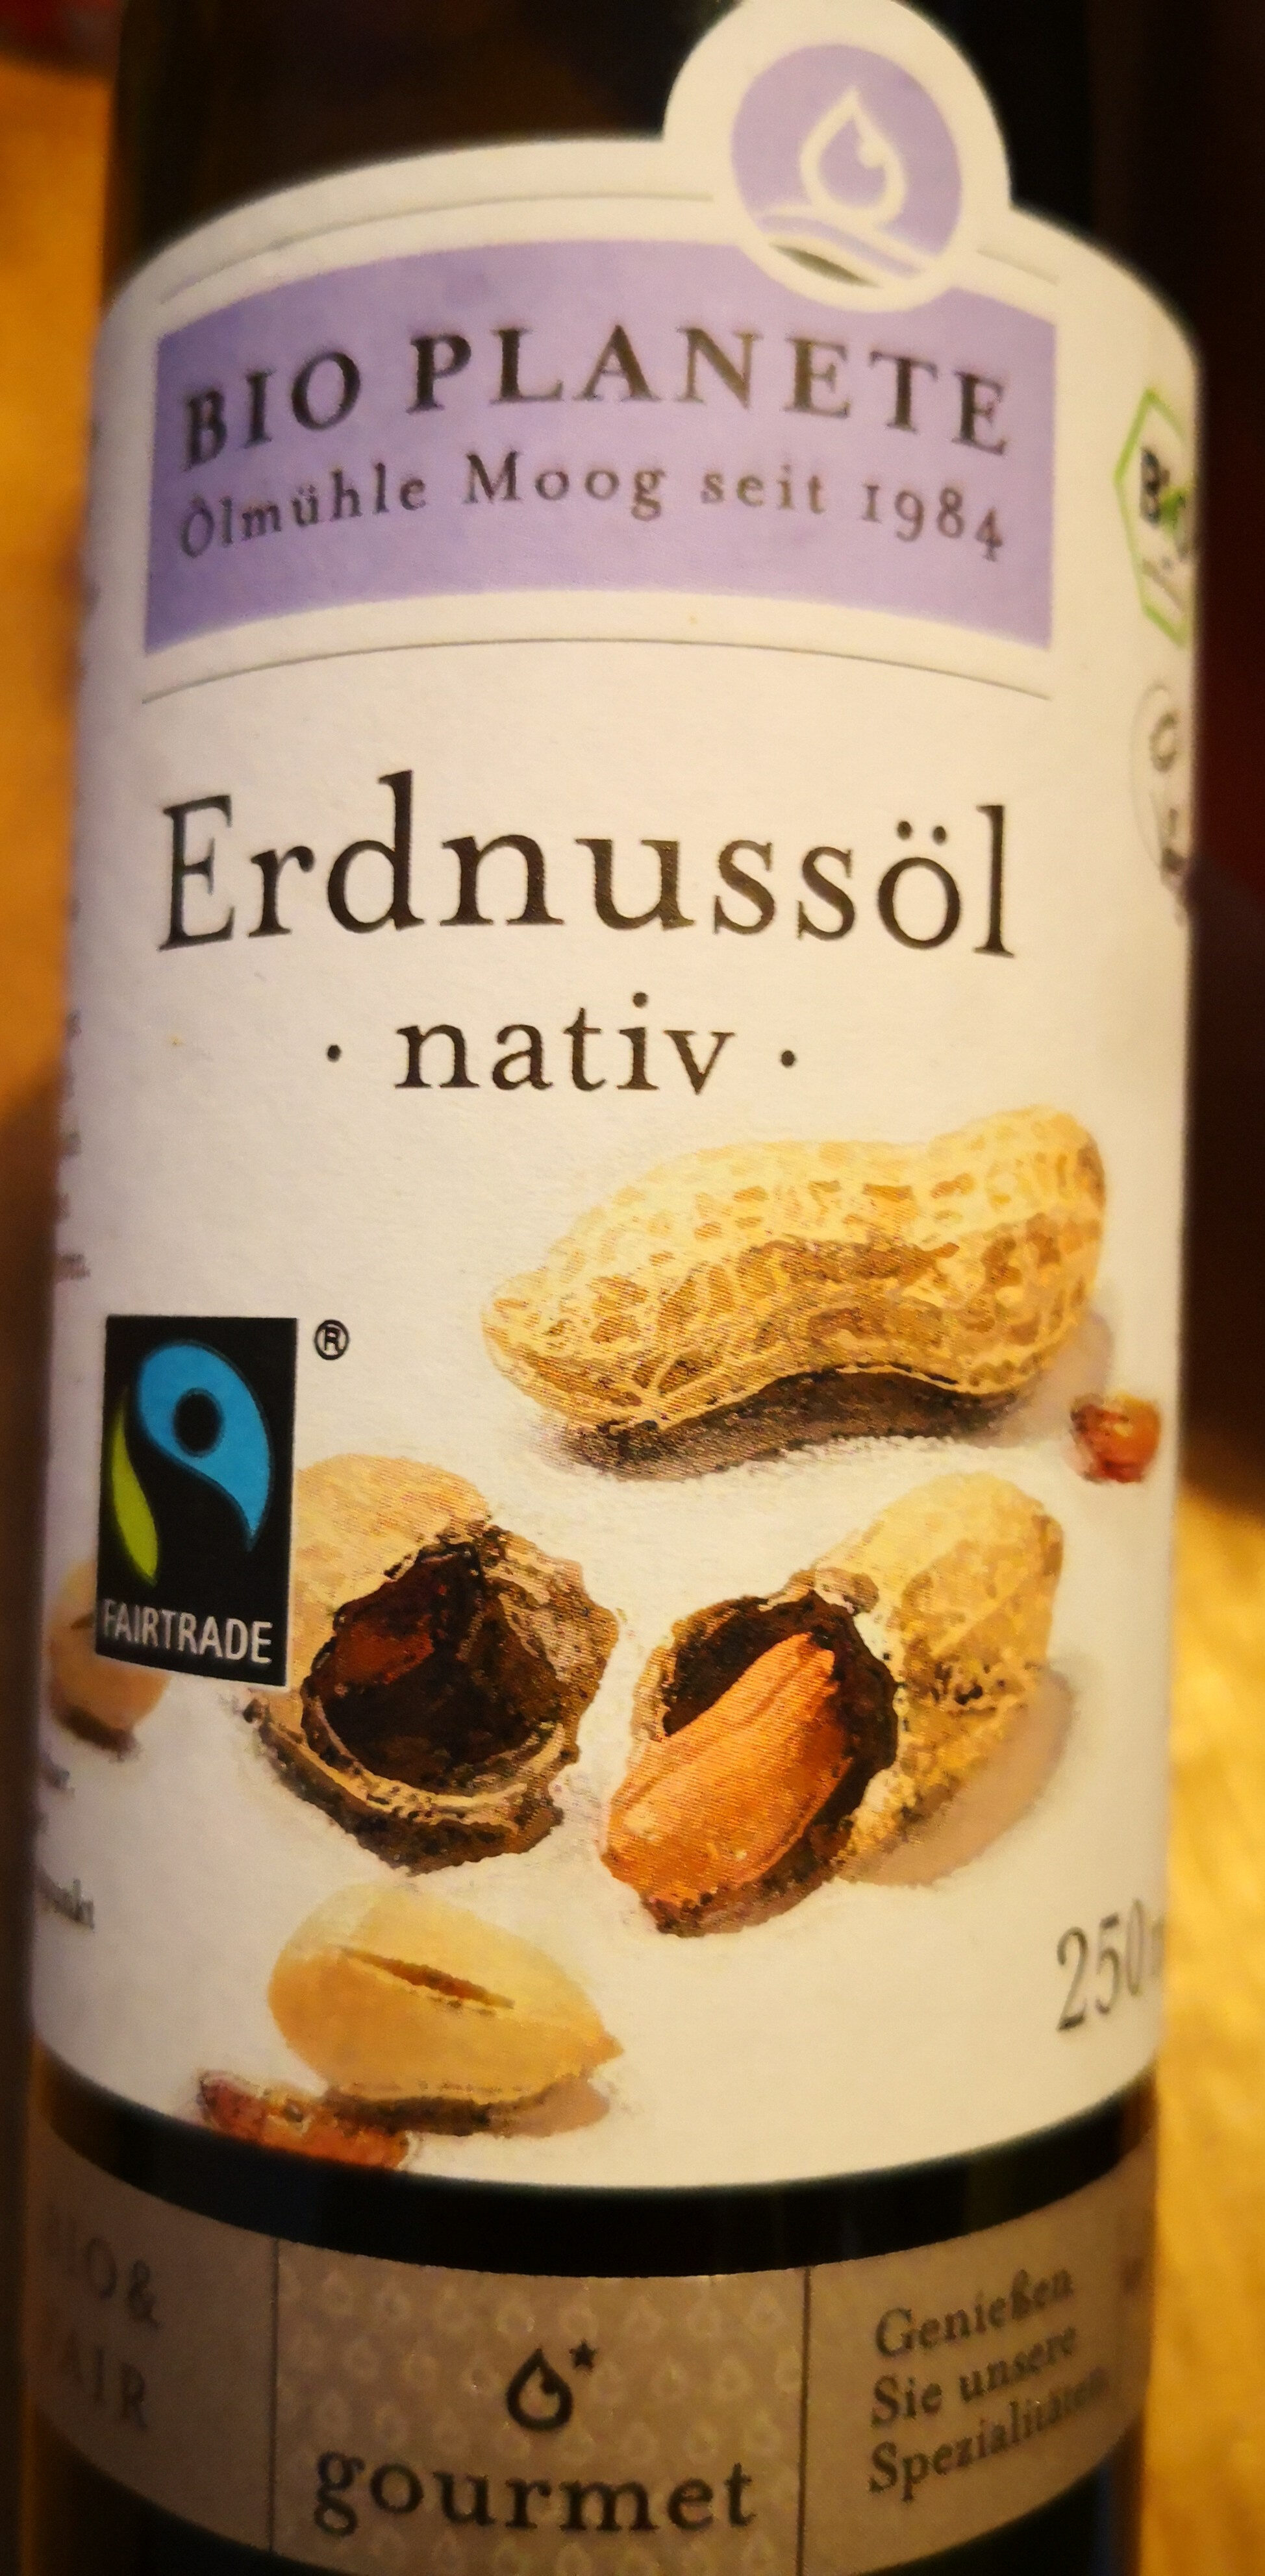 Erdnussöl nativ - Product - de